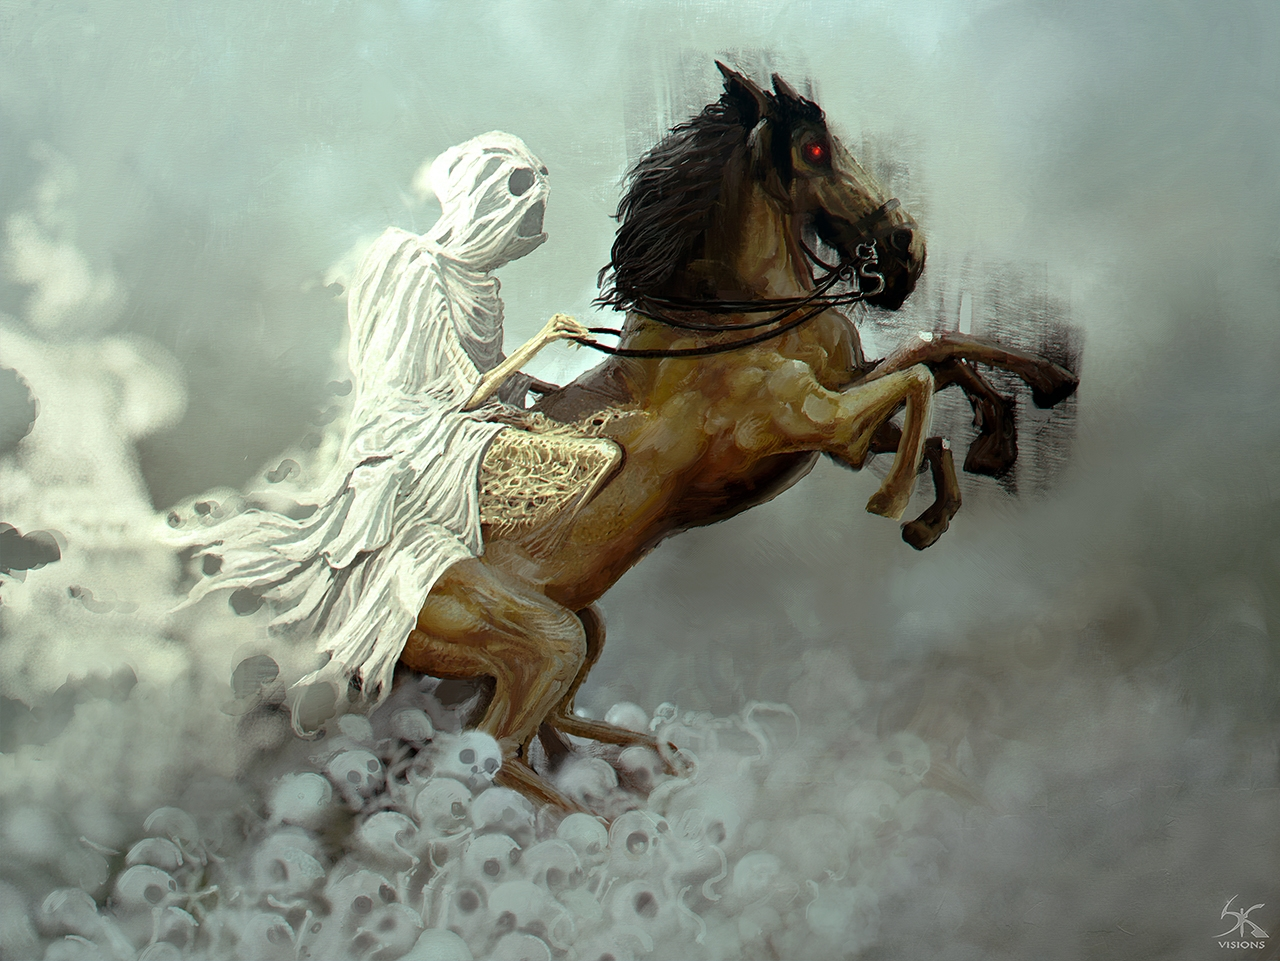 Title Ghost Rider rider Aka sou - sanskarans | ello